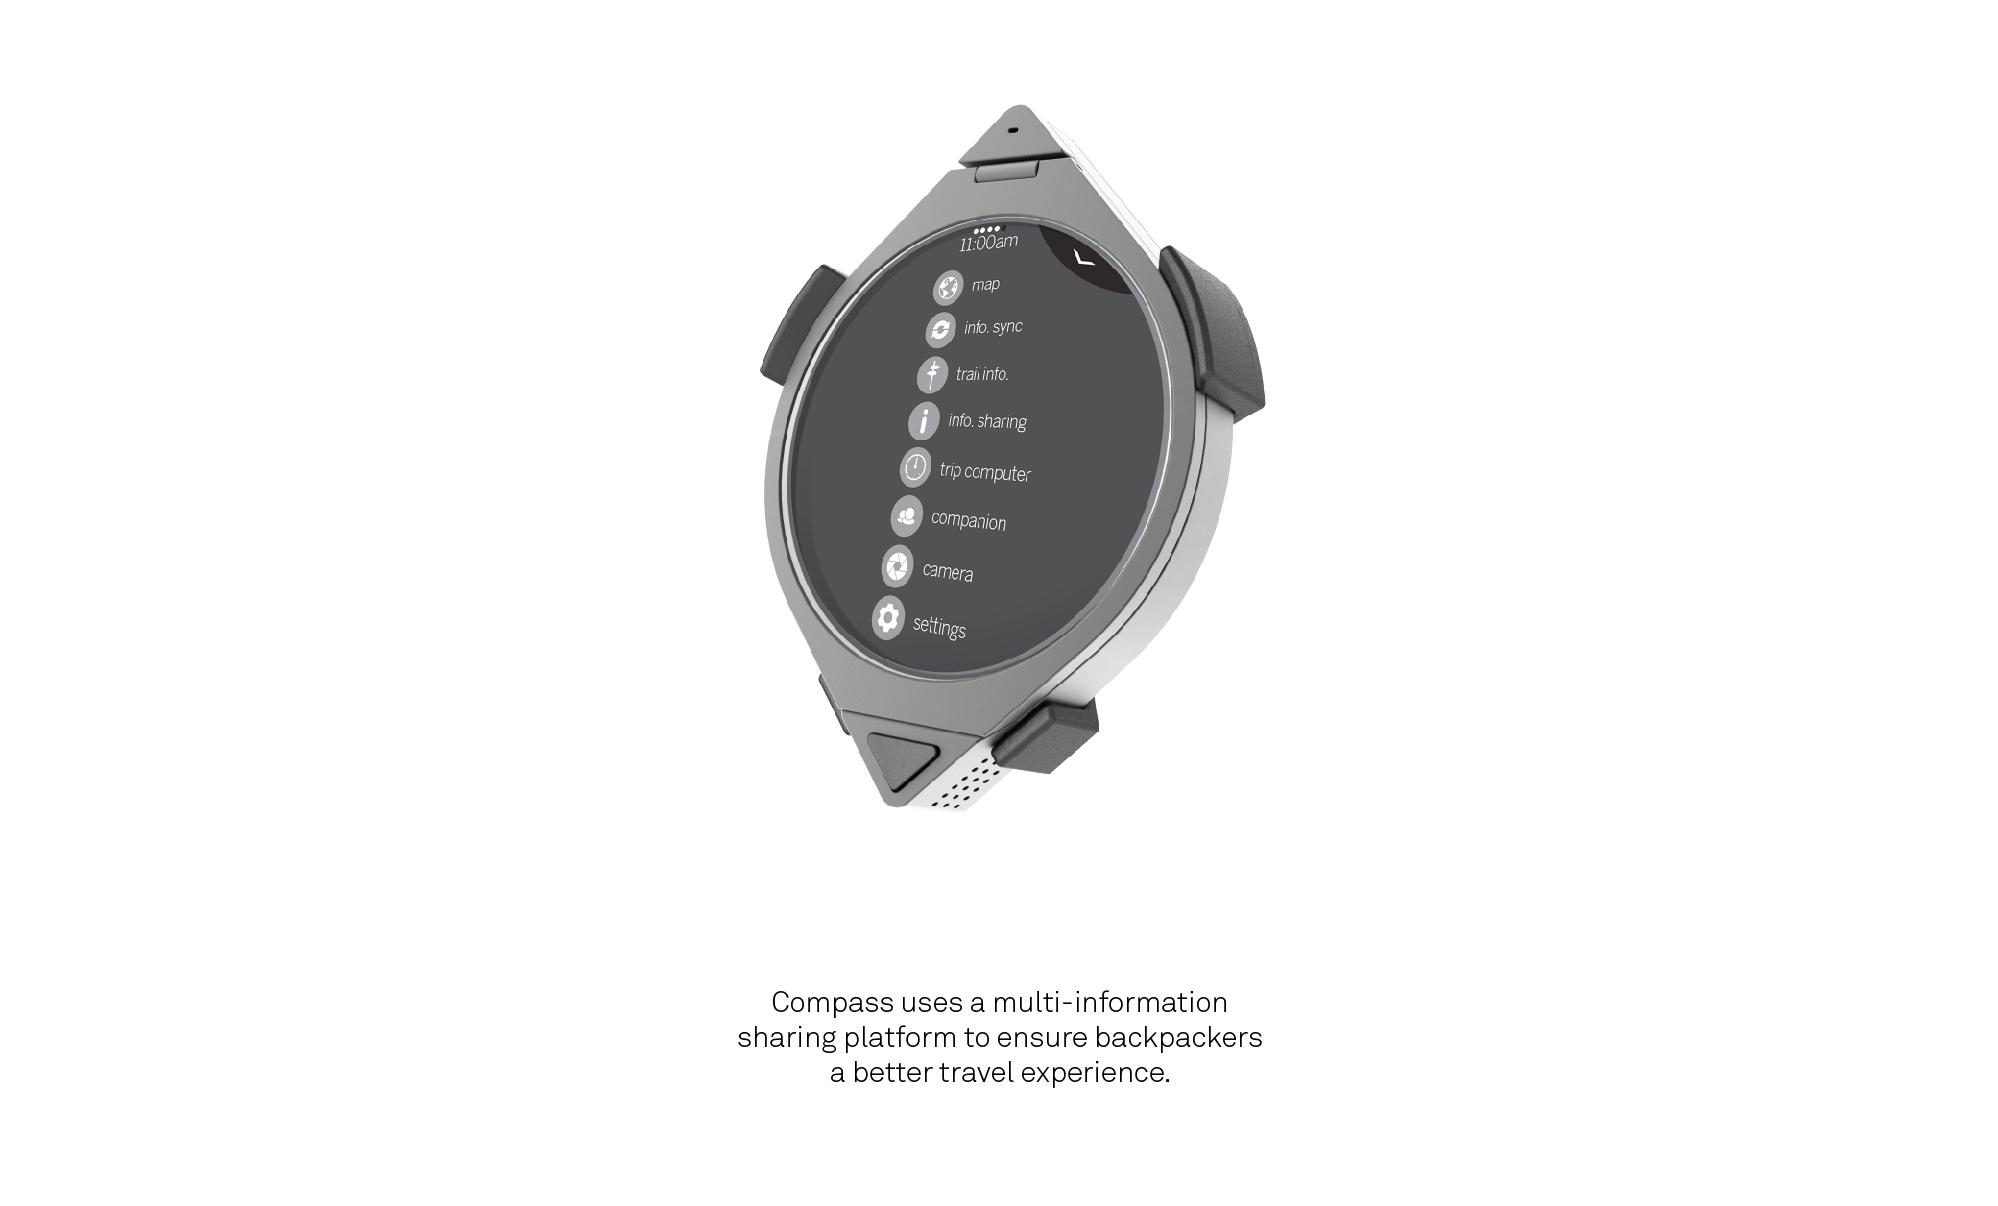 compass copy-04.jpg